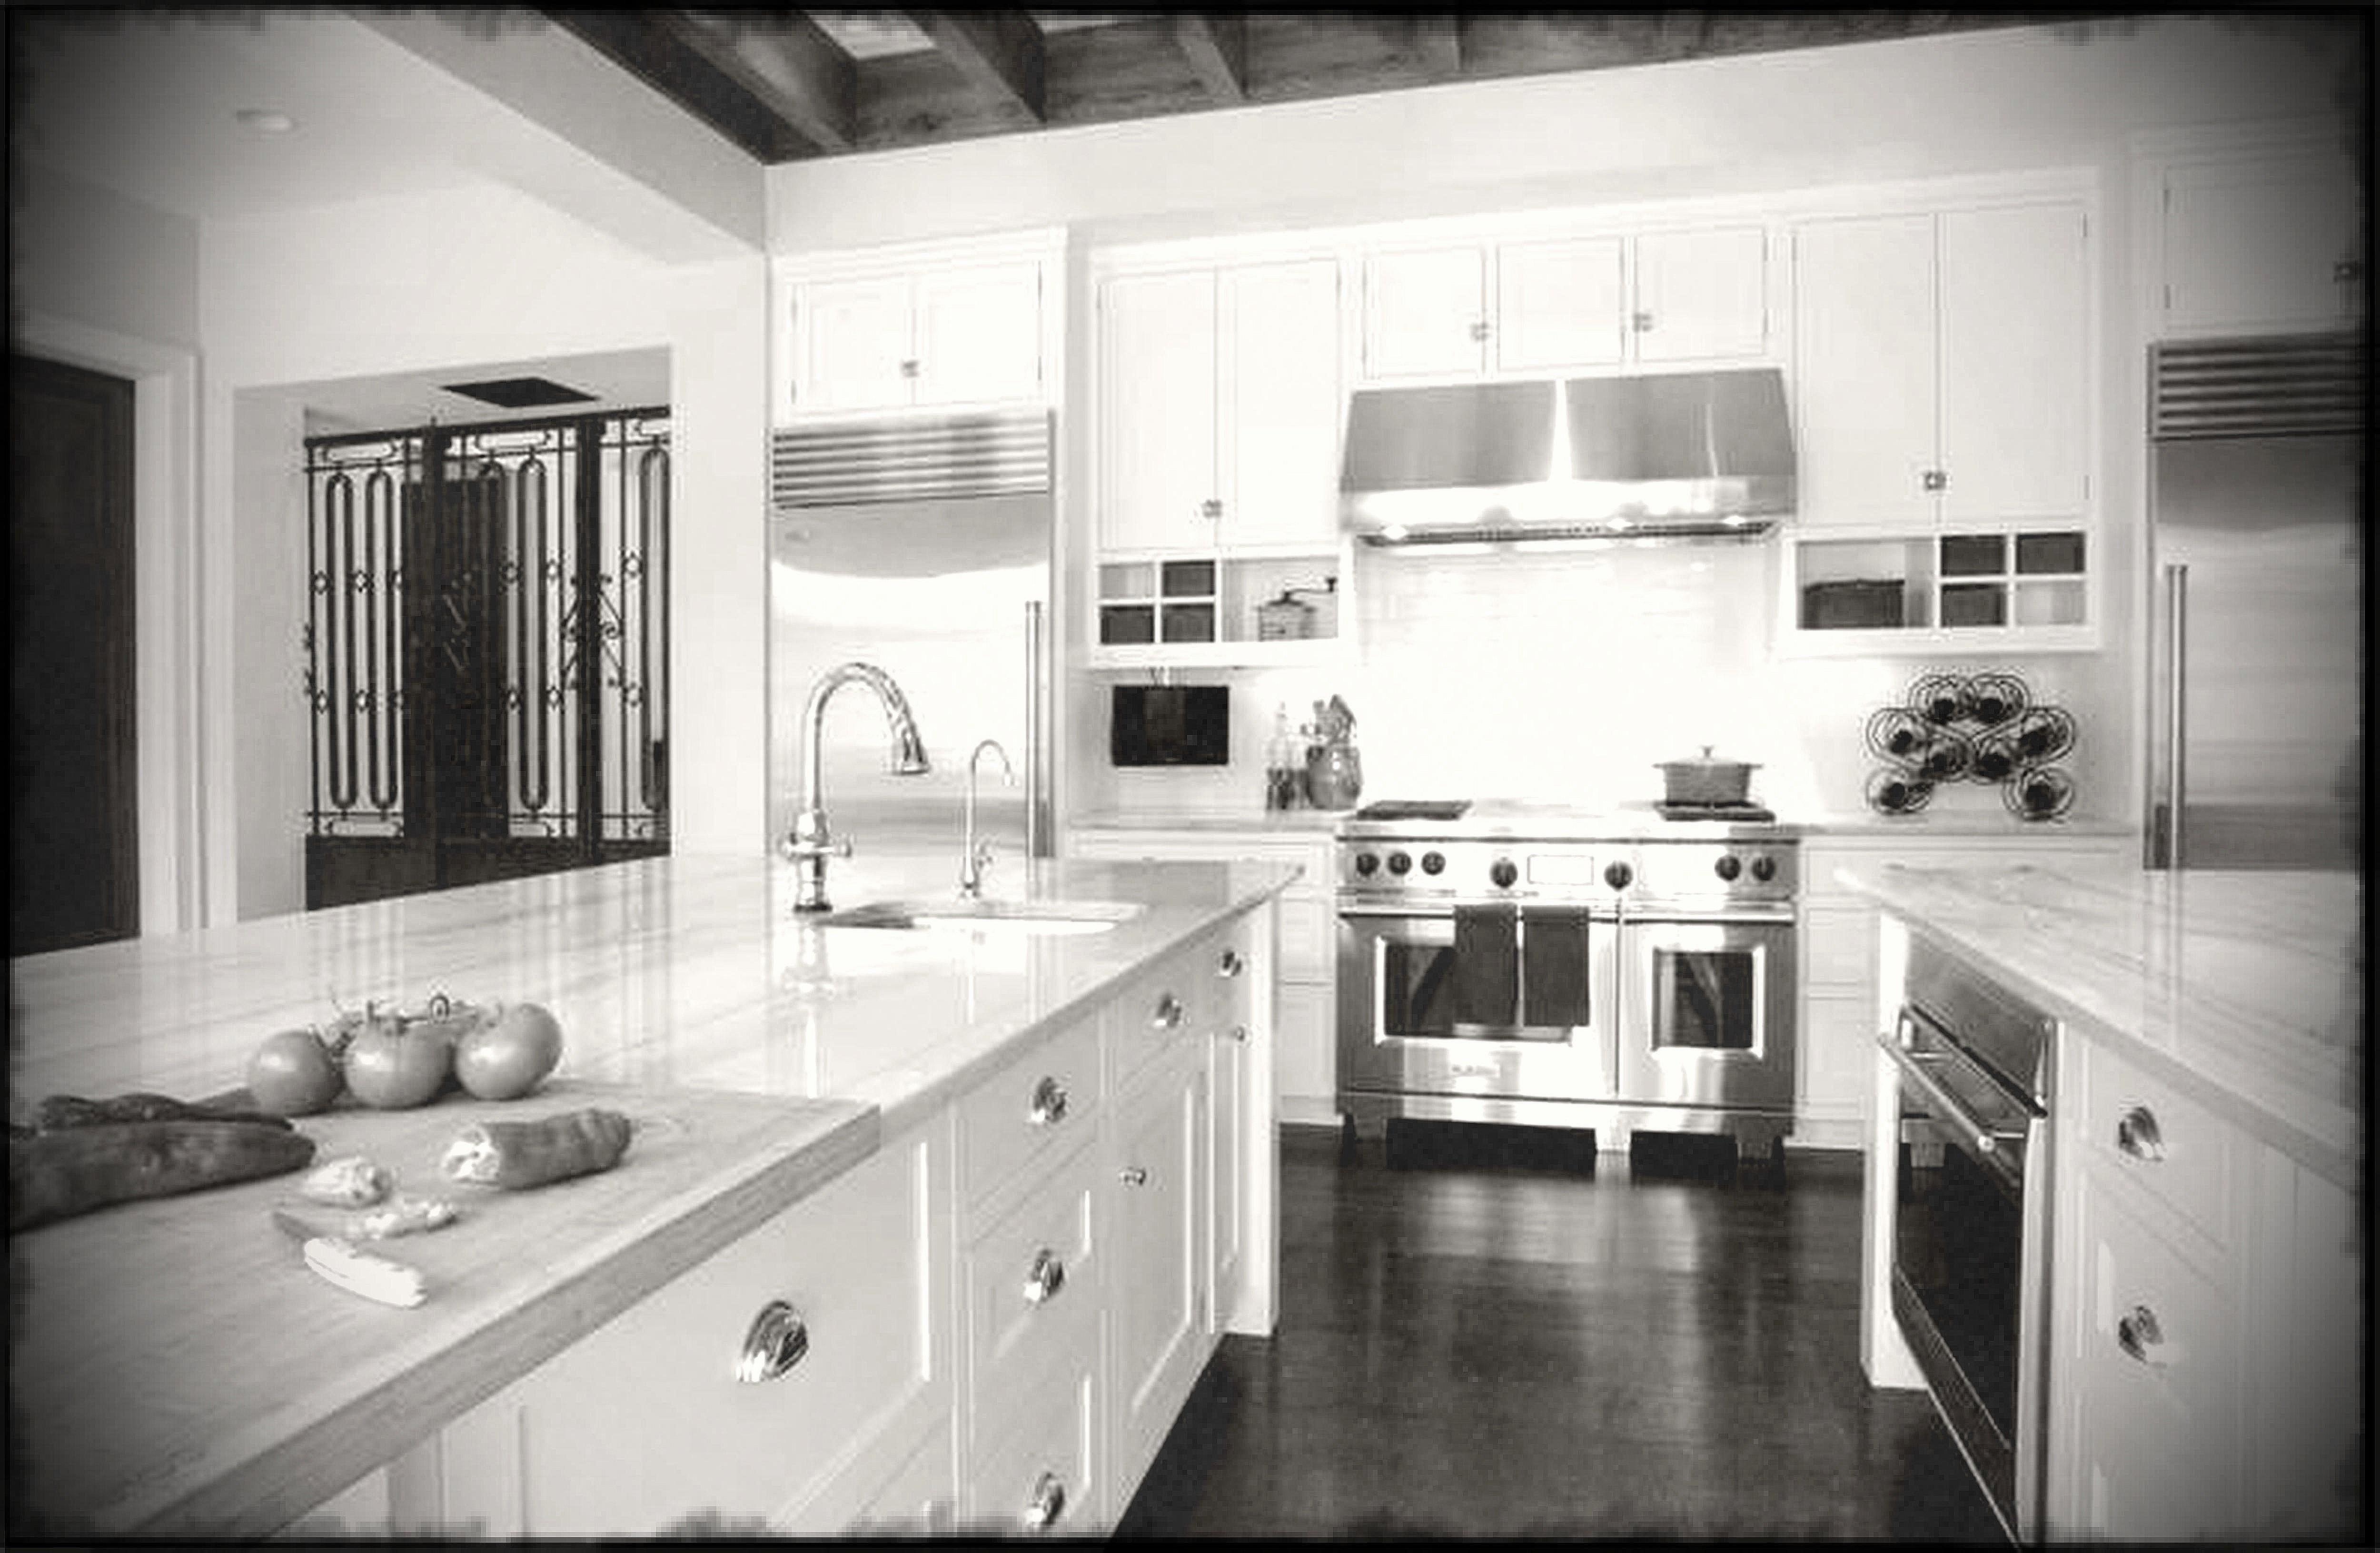 Inspirational Kitchen Ideas Tulsa In 2020 Kitchen Cabinets Kitchen Remodel White Kitchen